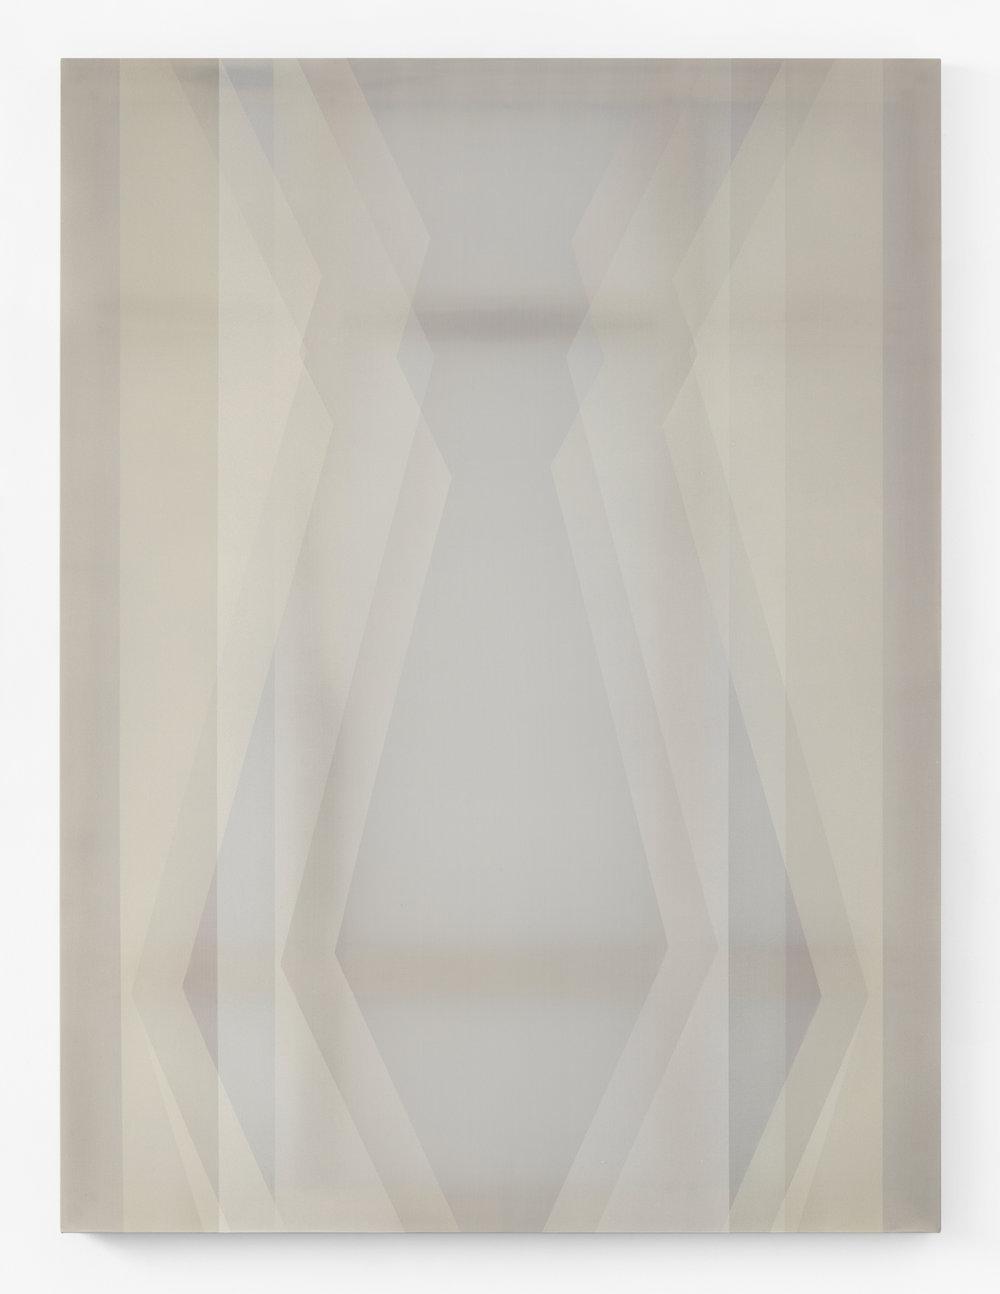 betrothen  acrylic on silk 60 in x 45 in 2018